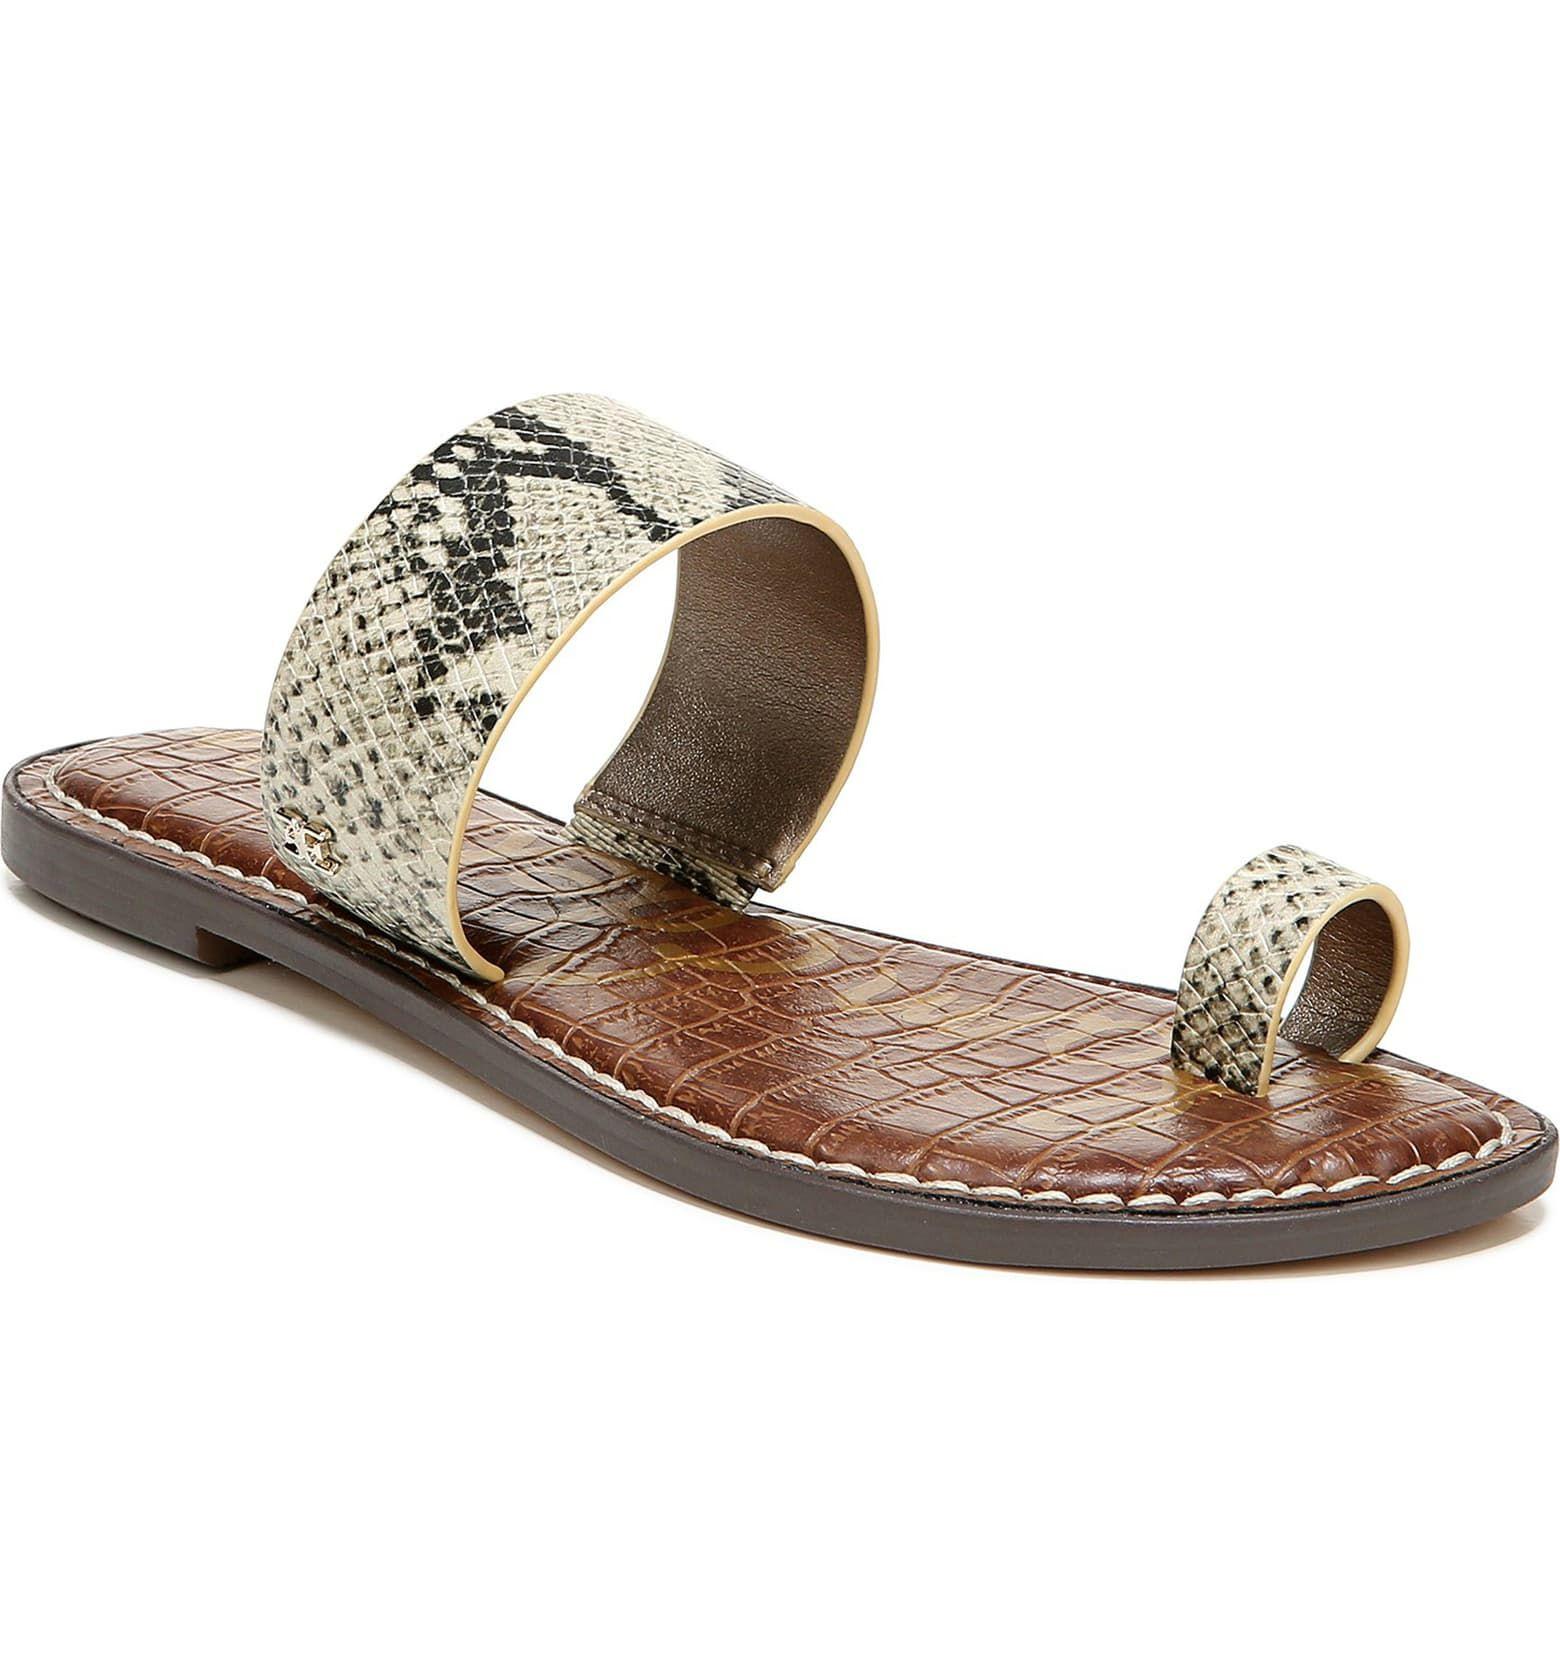 Sam Edelman Gorgene Flat Sandal Women Nordstrom In 2020 Womens Sandals Sandals Sam Edelman